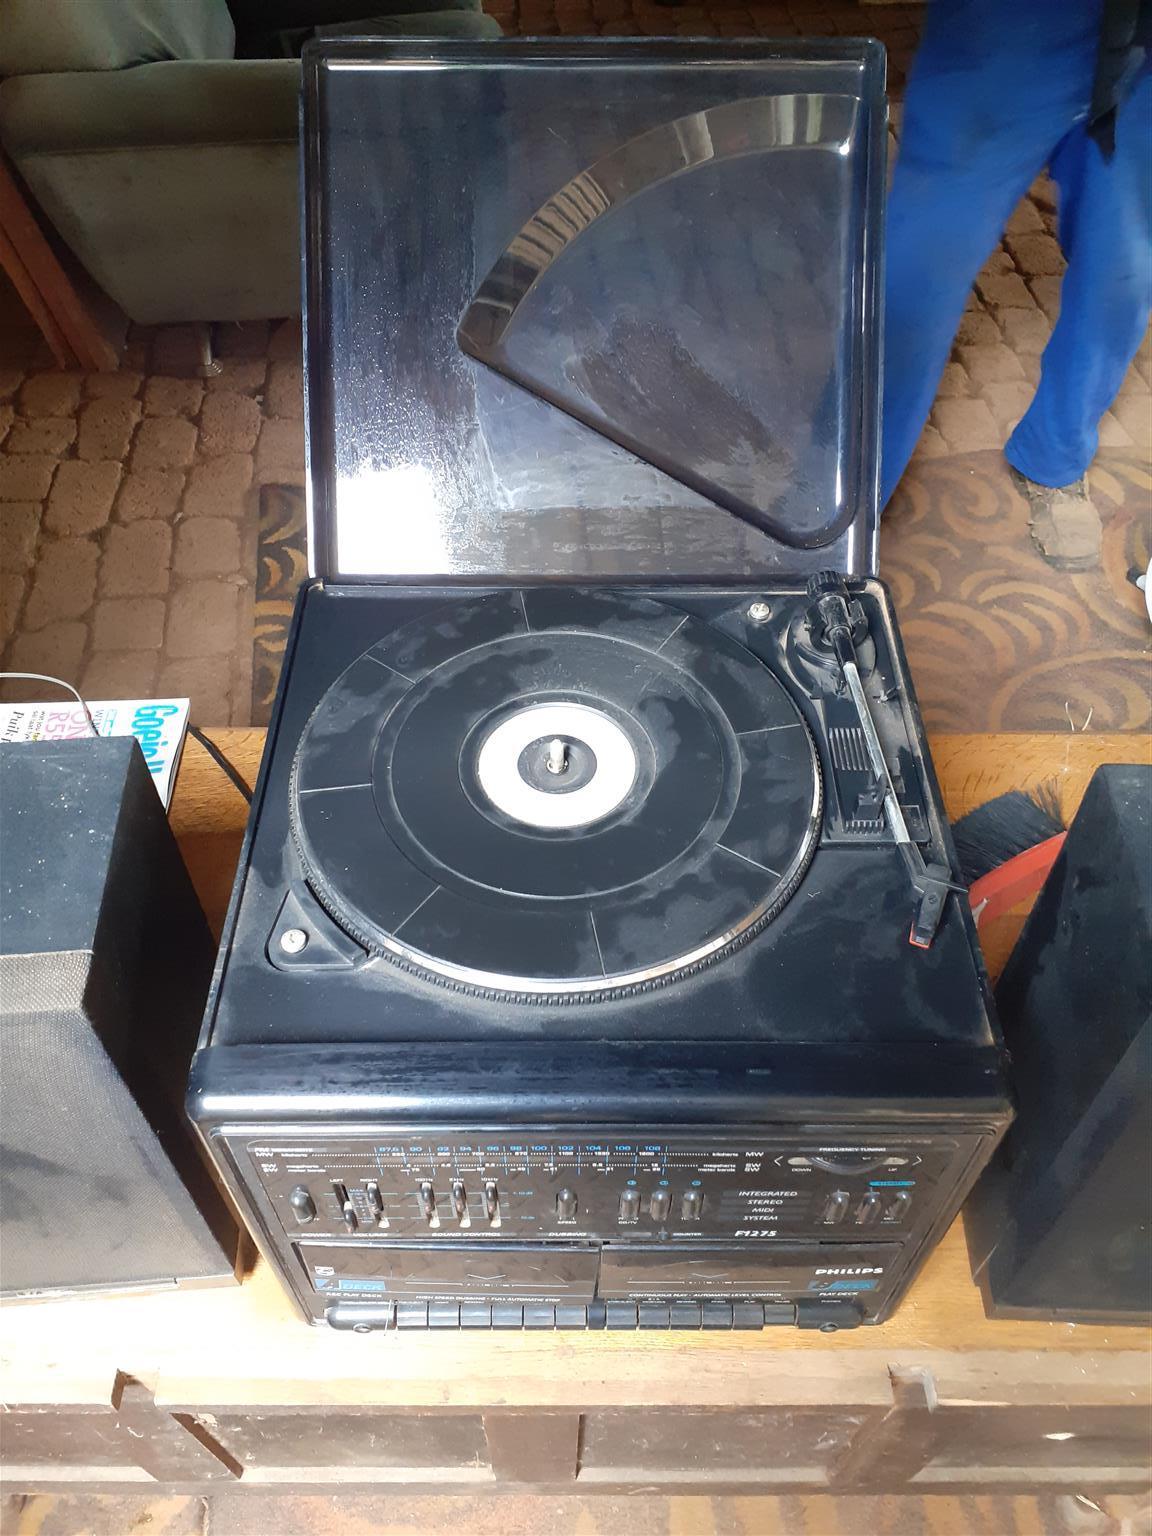 Phillips radio